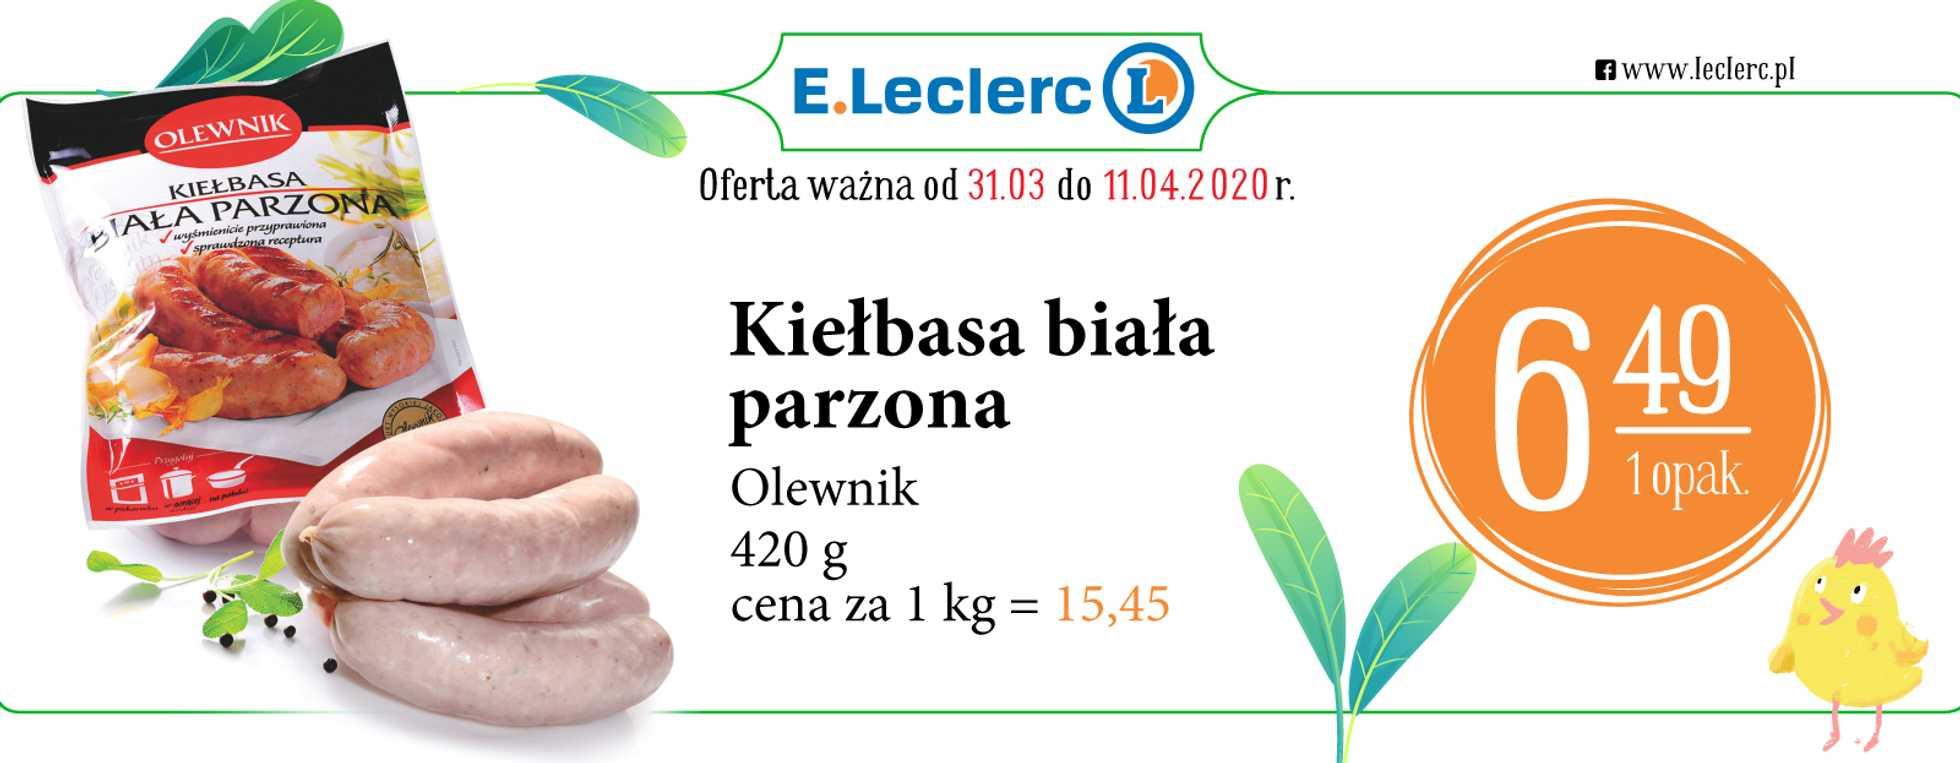 E.Leclerc - gazetka promocyjna ważna od 31.03.2020 do 11.04.2020 - strona 4.